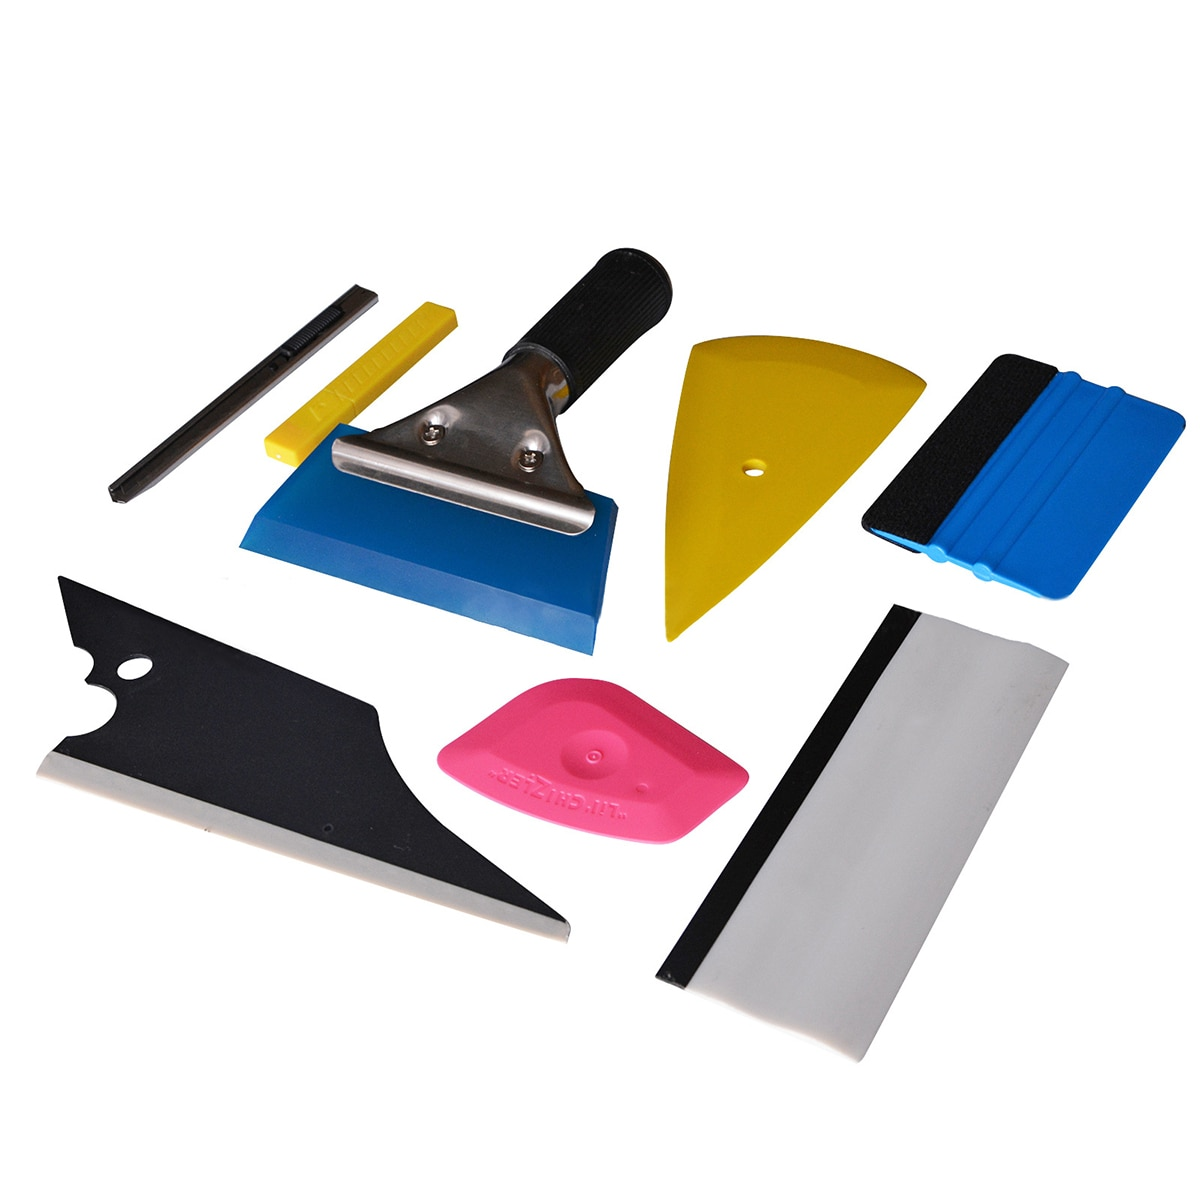 8 Pcs Car Wrap Stickers Kit Vinyl Auto Car Accessories Window Vinyl Film Installation Tools Tinting Squeegee Film Cutter Scraper